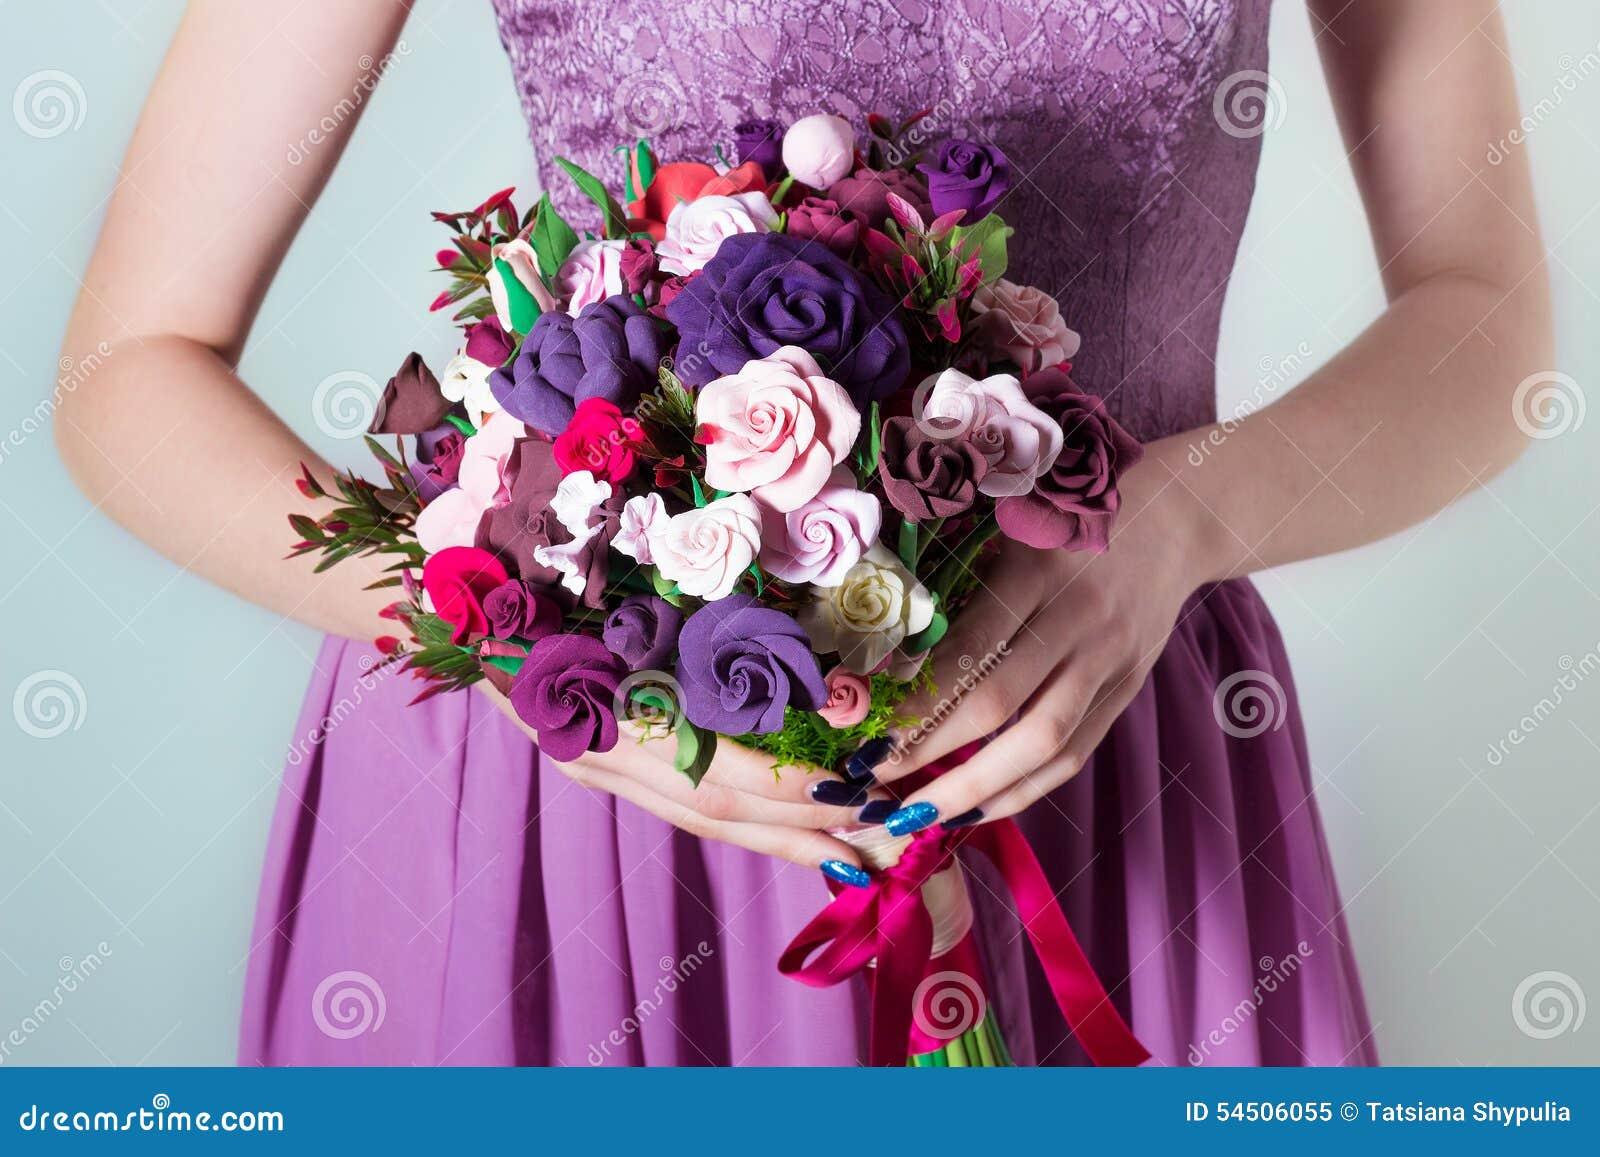 Букет цветов на руках фото